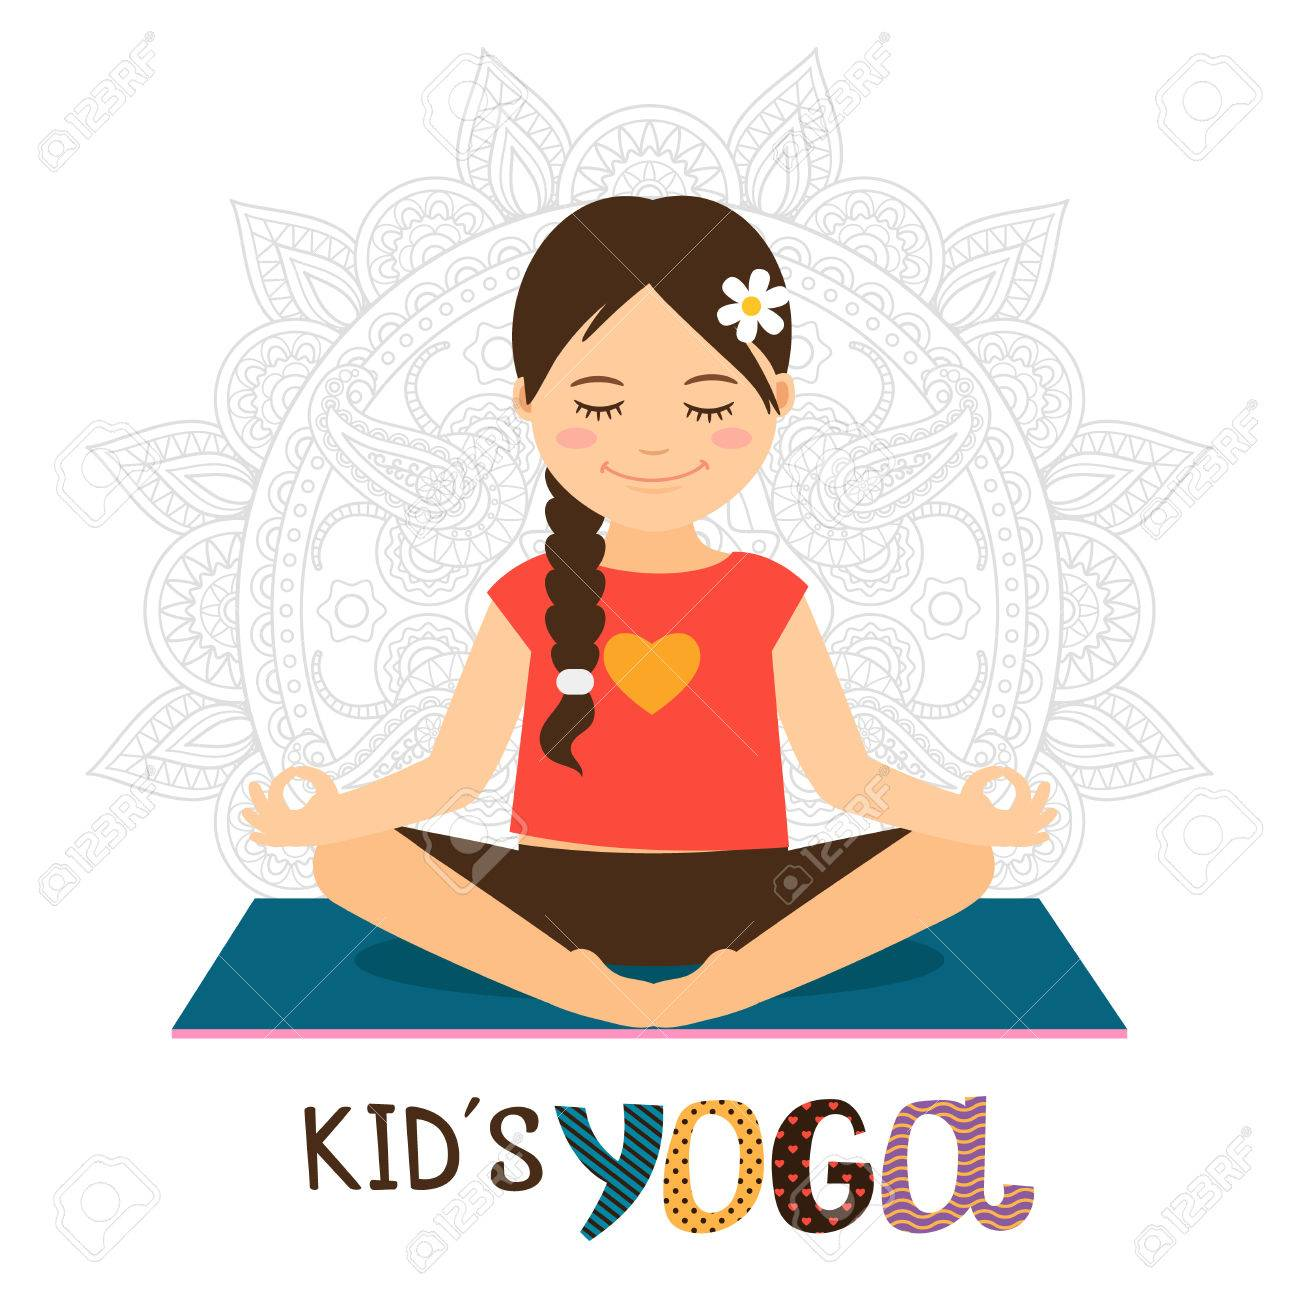 Kids yoga vector illustration with beautiful girl in lotus pose - 67526638